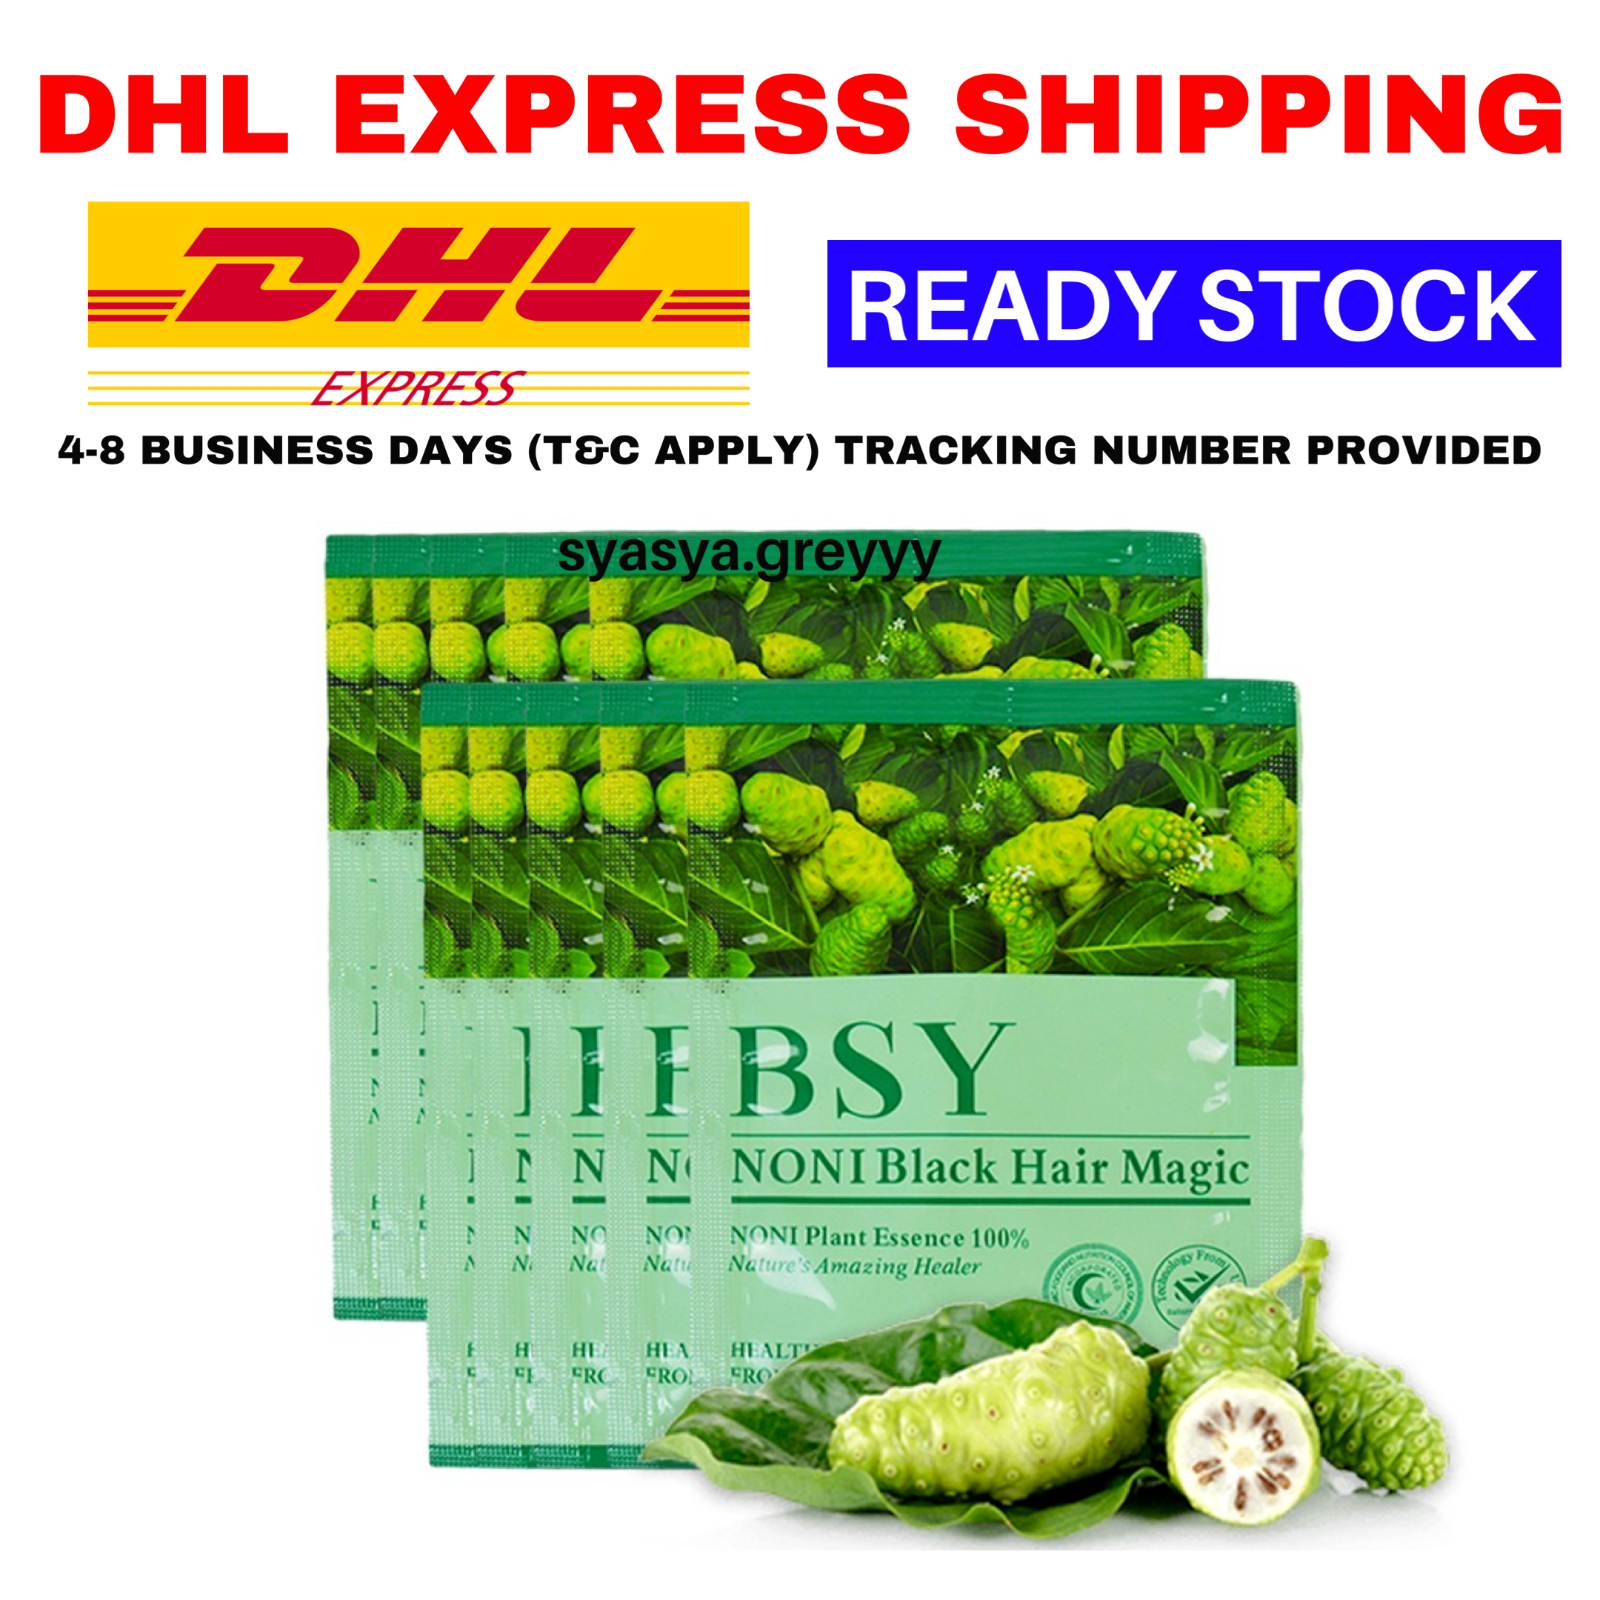 40 X BSY Noni Black Grey Hair Removal Magic Herbal Essence Shampo Dye 20ml DHL - $46.01